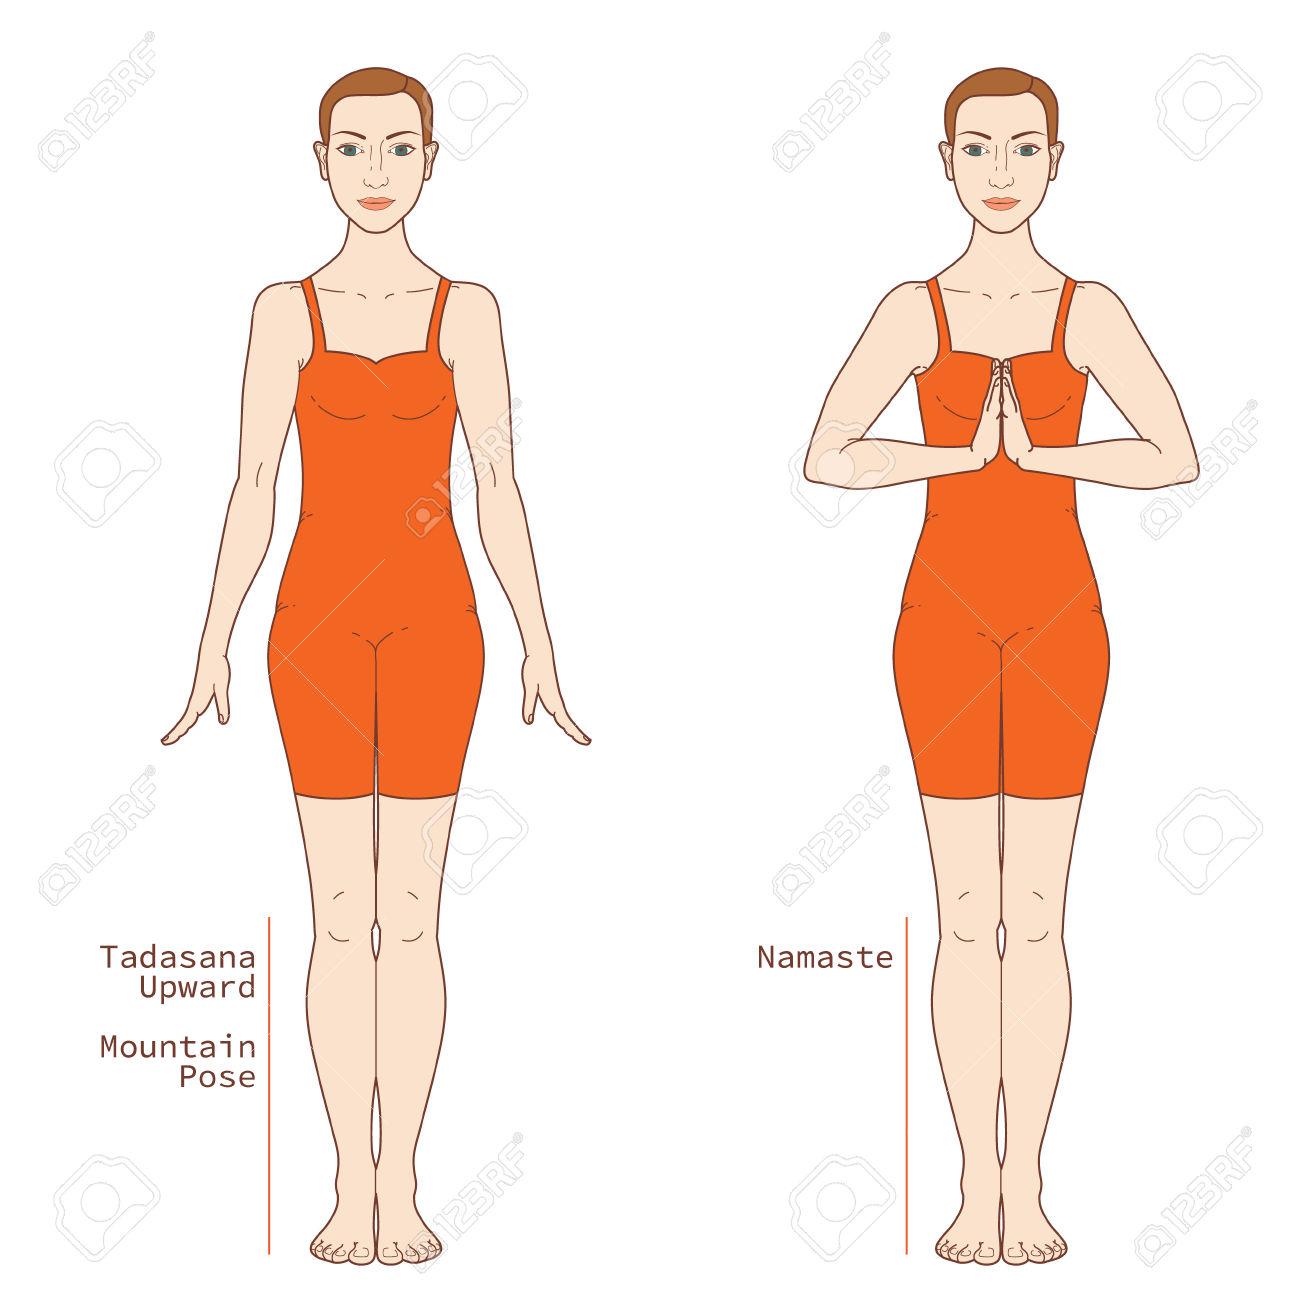 Tadasana Yoga Pose Png - Yoga Pose Image Includes The Phrase Tadasana, Transparent background PNG HD thumbnail